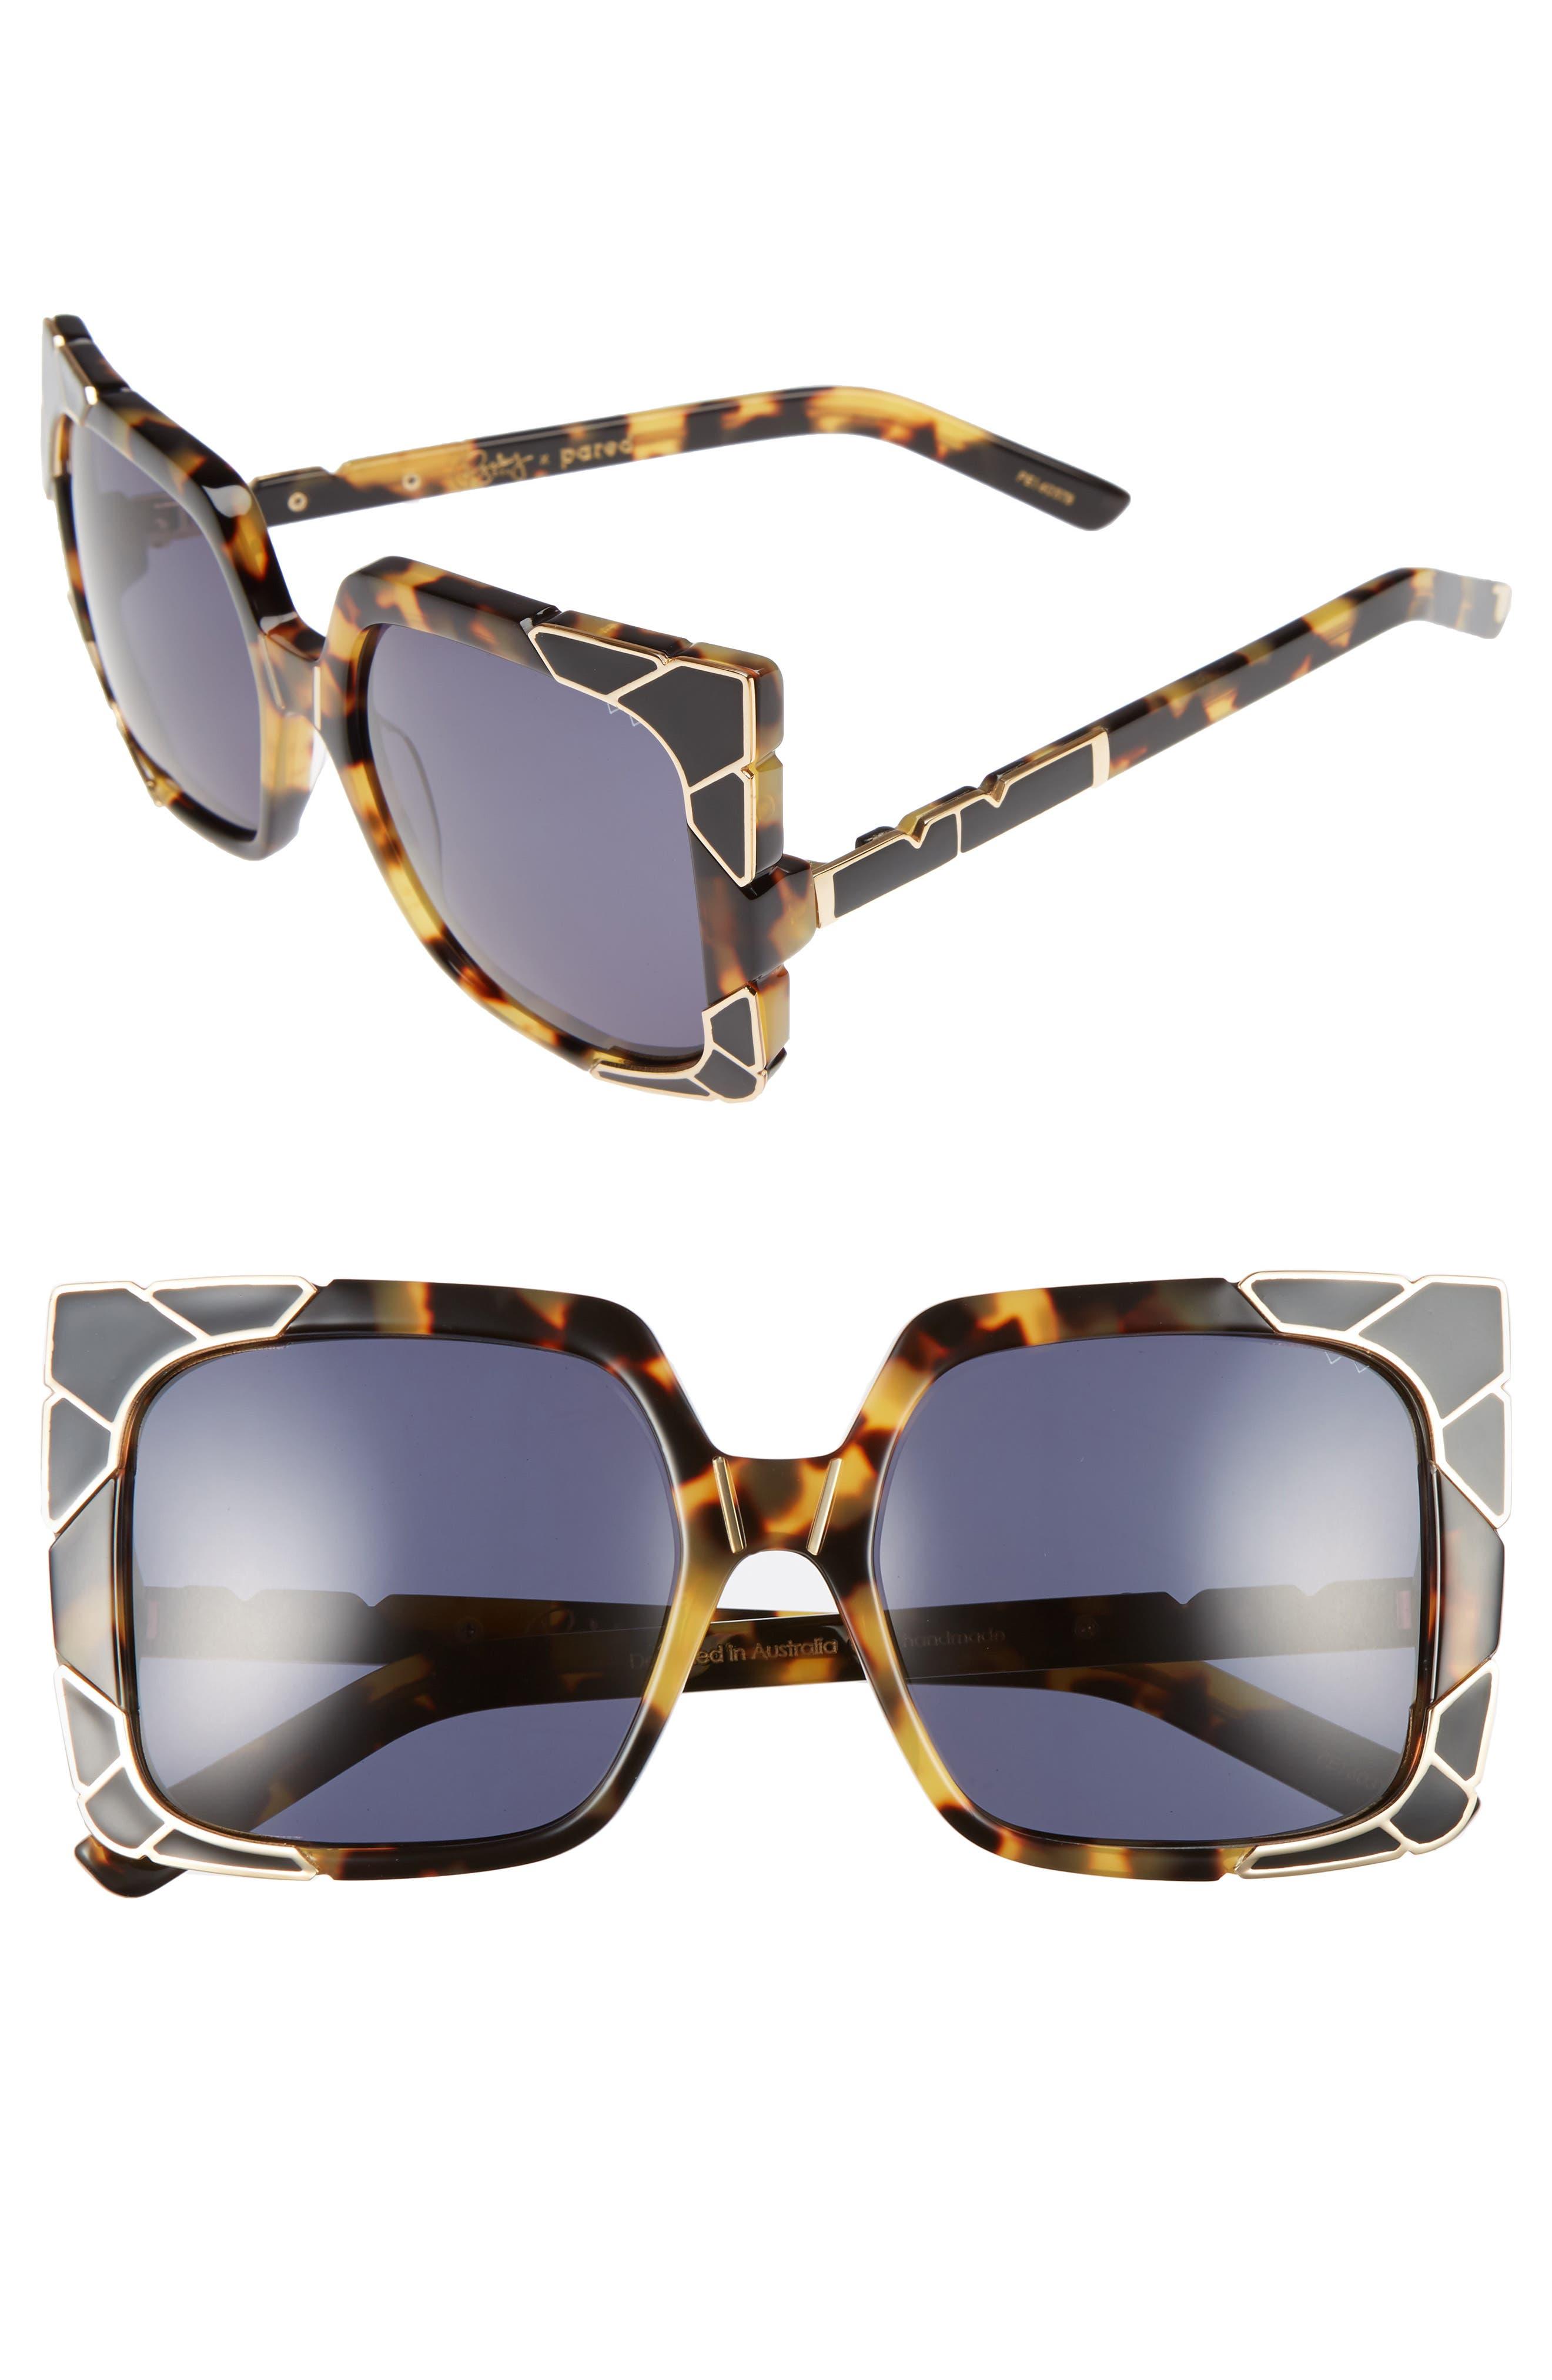 Sun & Shade 55mm Square Retro Sunglasses,                         Main,                         color, DARK TORTOISE/ GOLD/ GREY